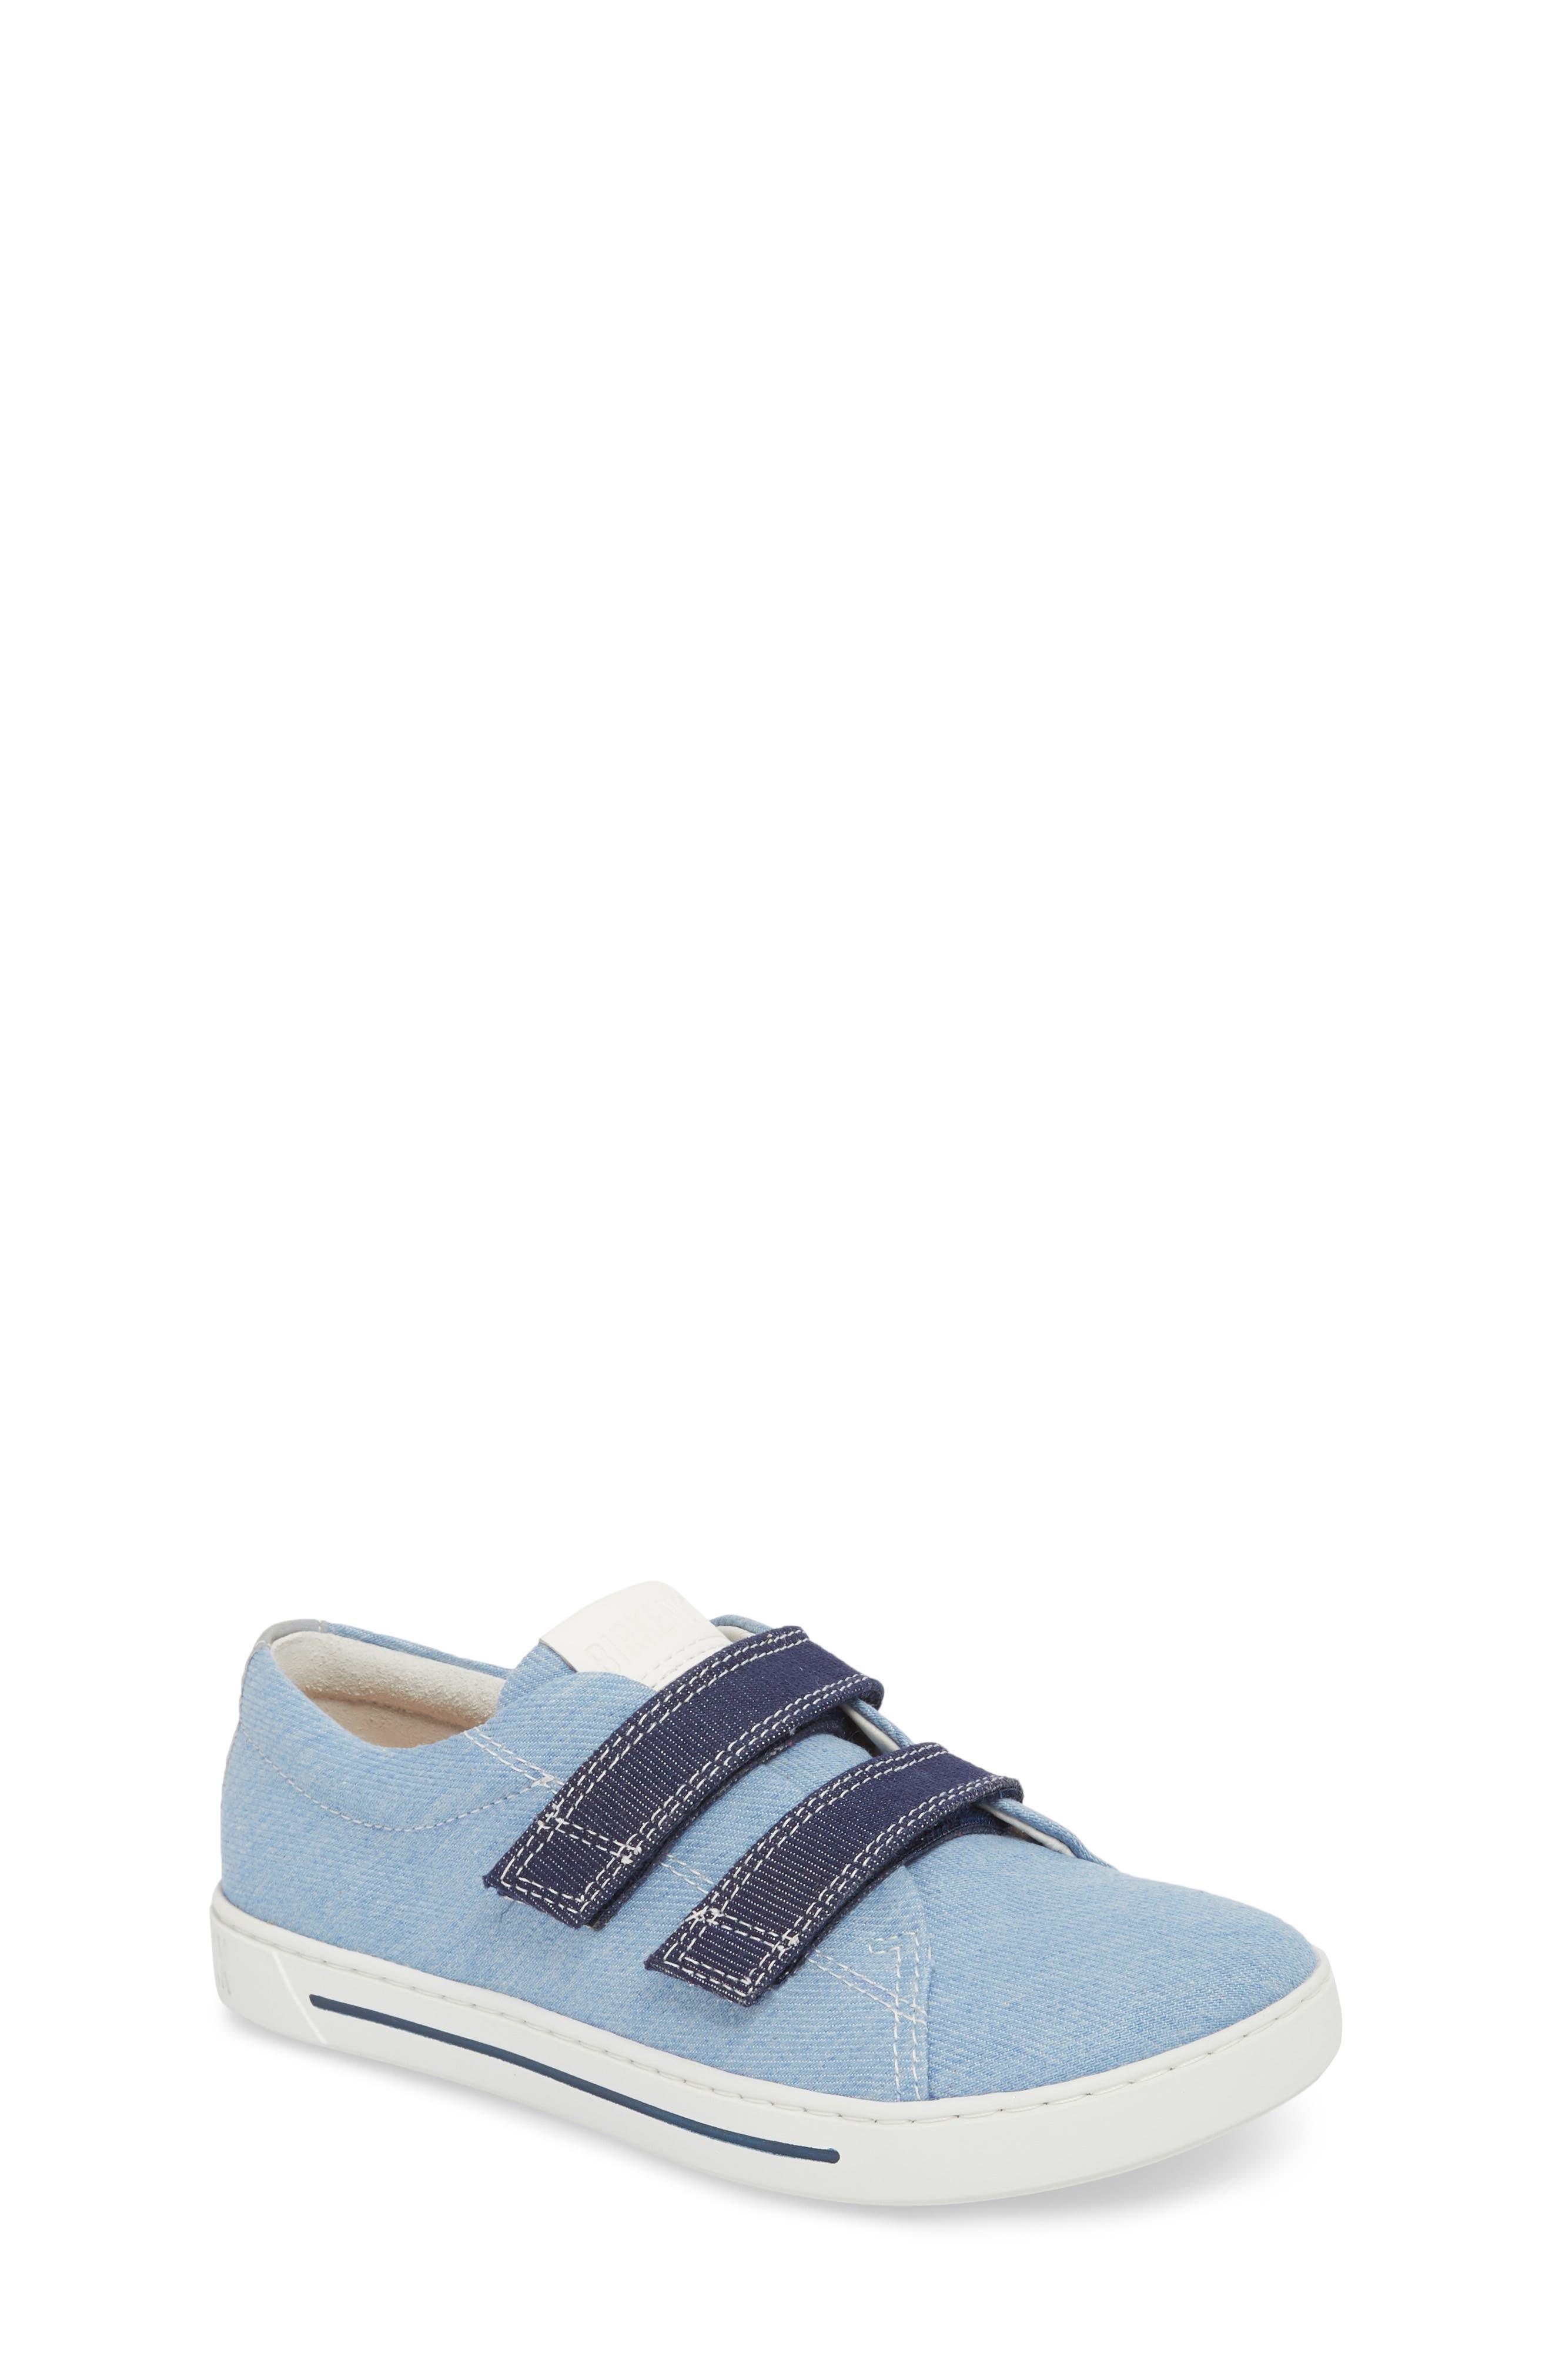 Main Image - Birkenstock Arran Sneaker (Toddler & Little Kid)